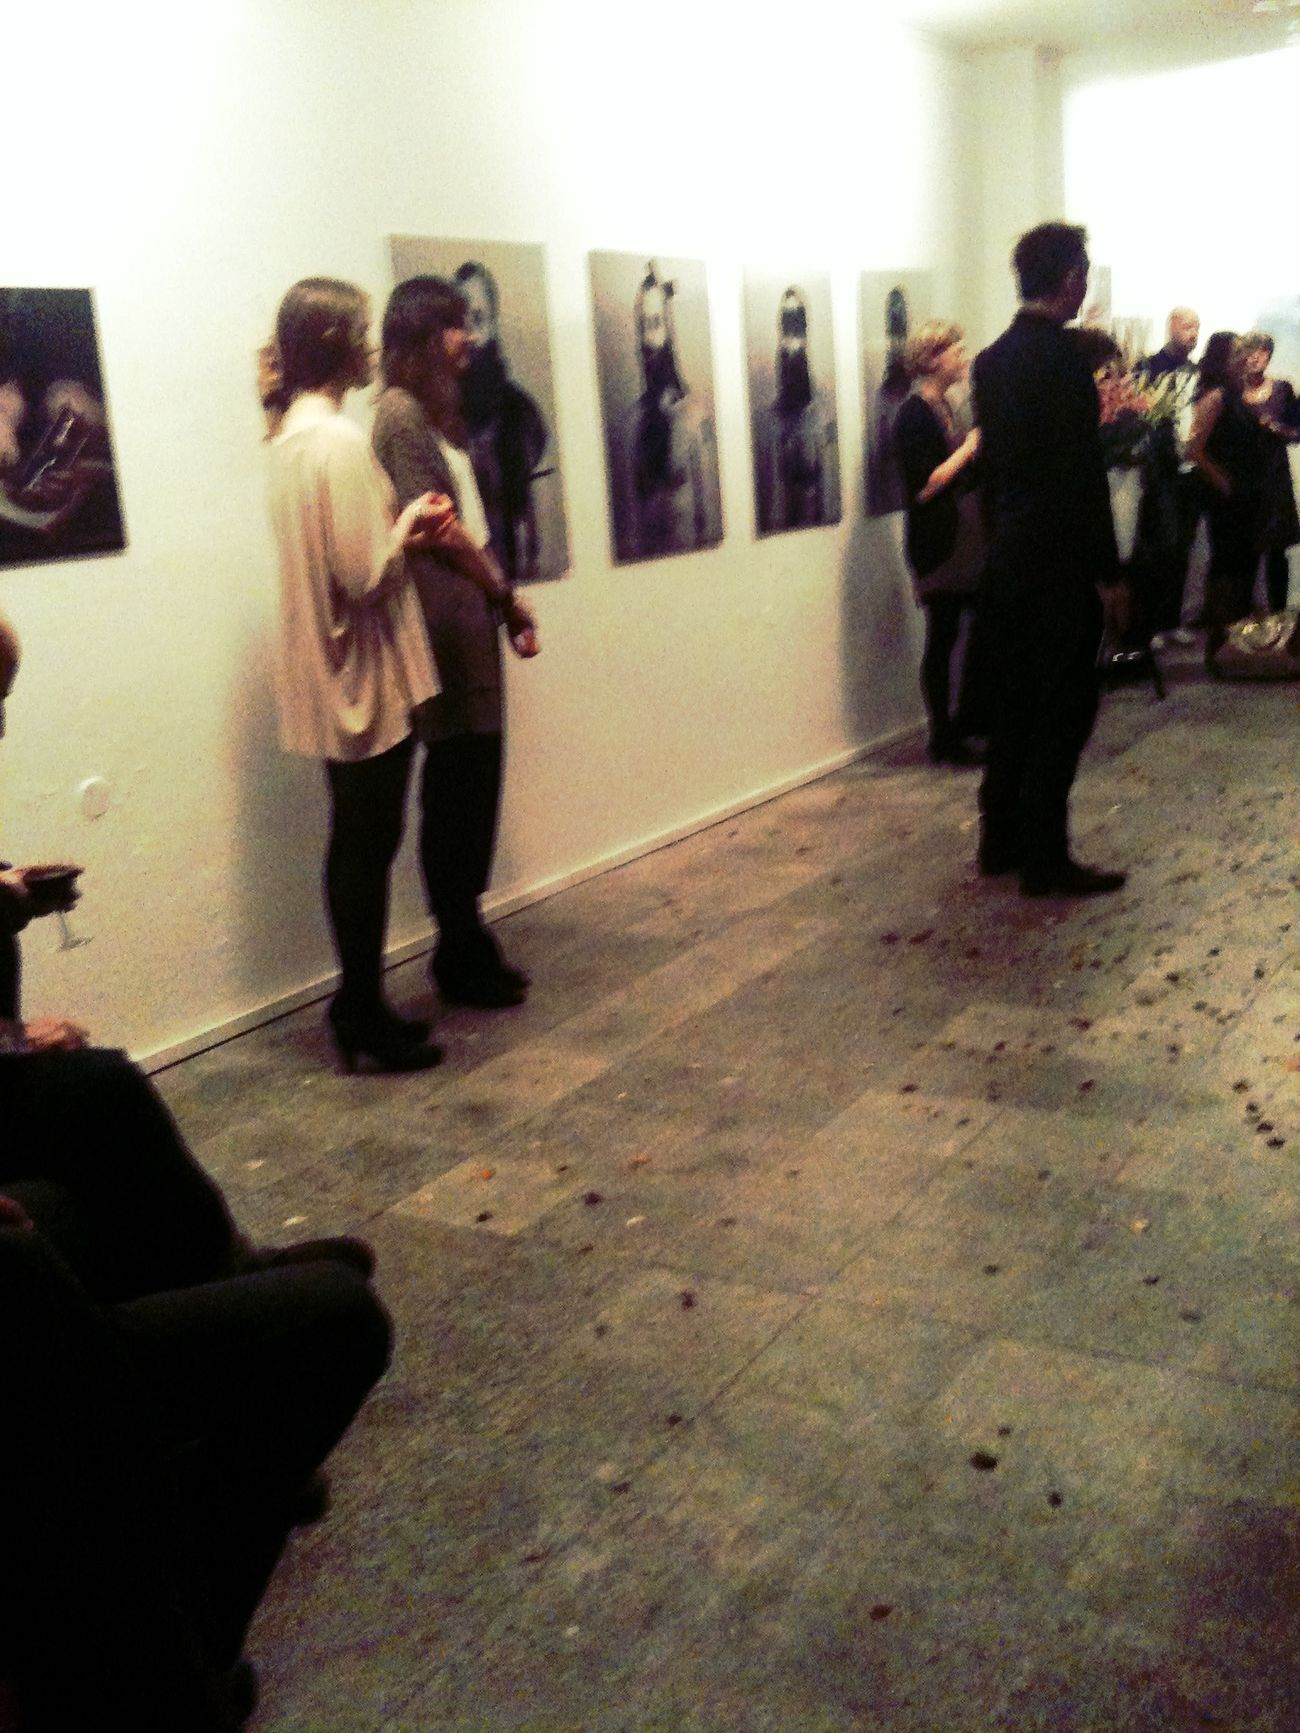 Atelier freier Fotografen at Berlin Atelier Freier Fotografen